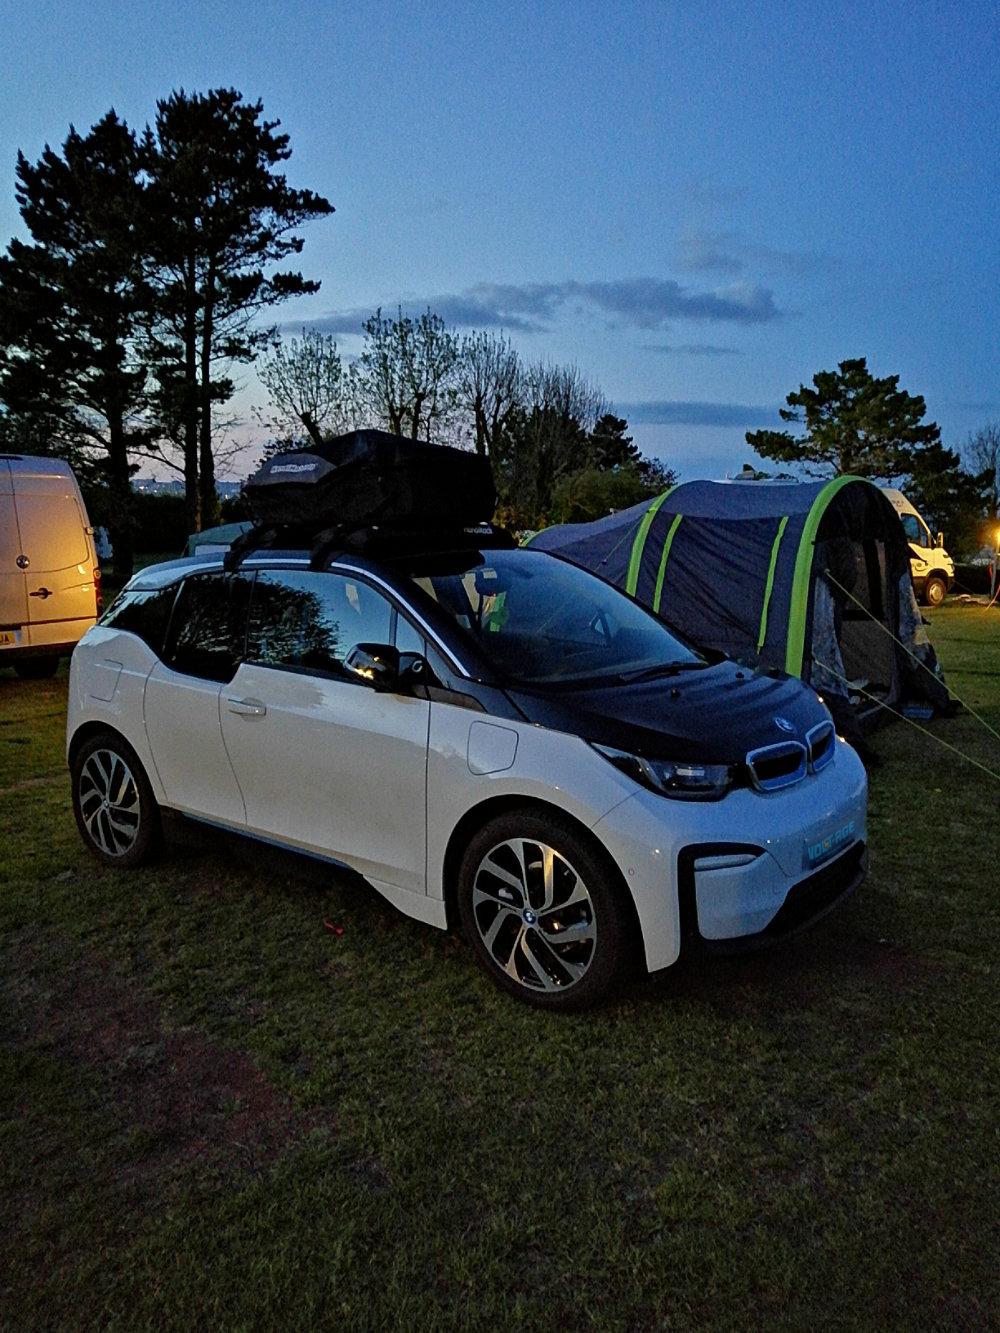 BMW i3 rental uk